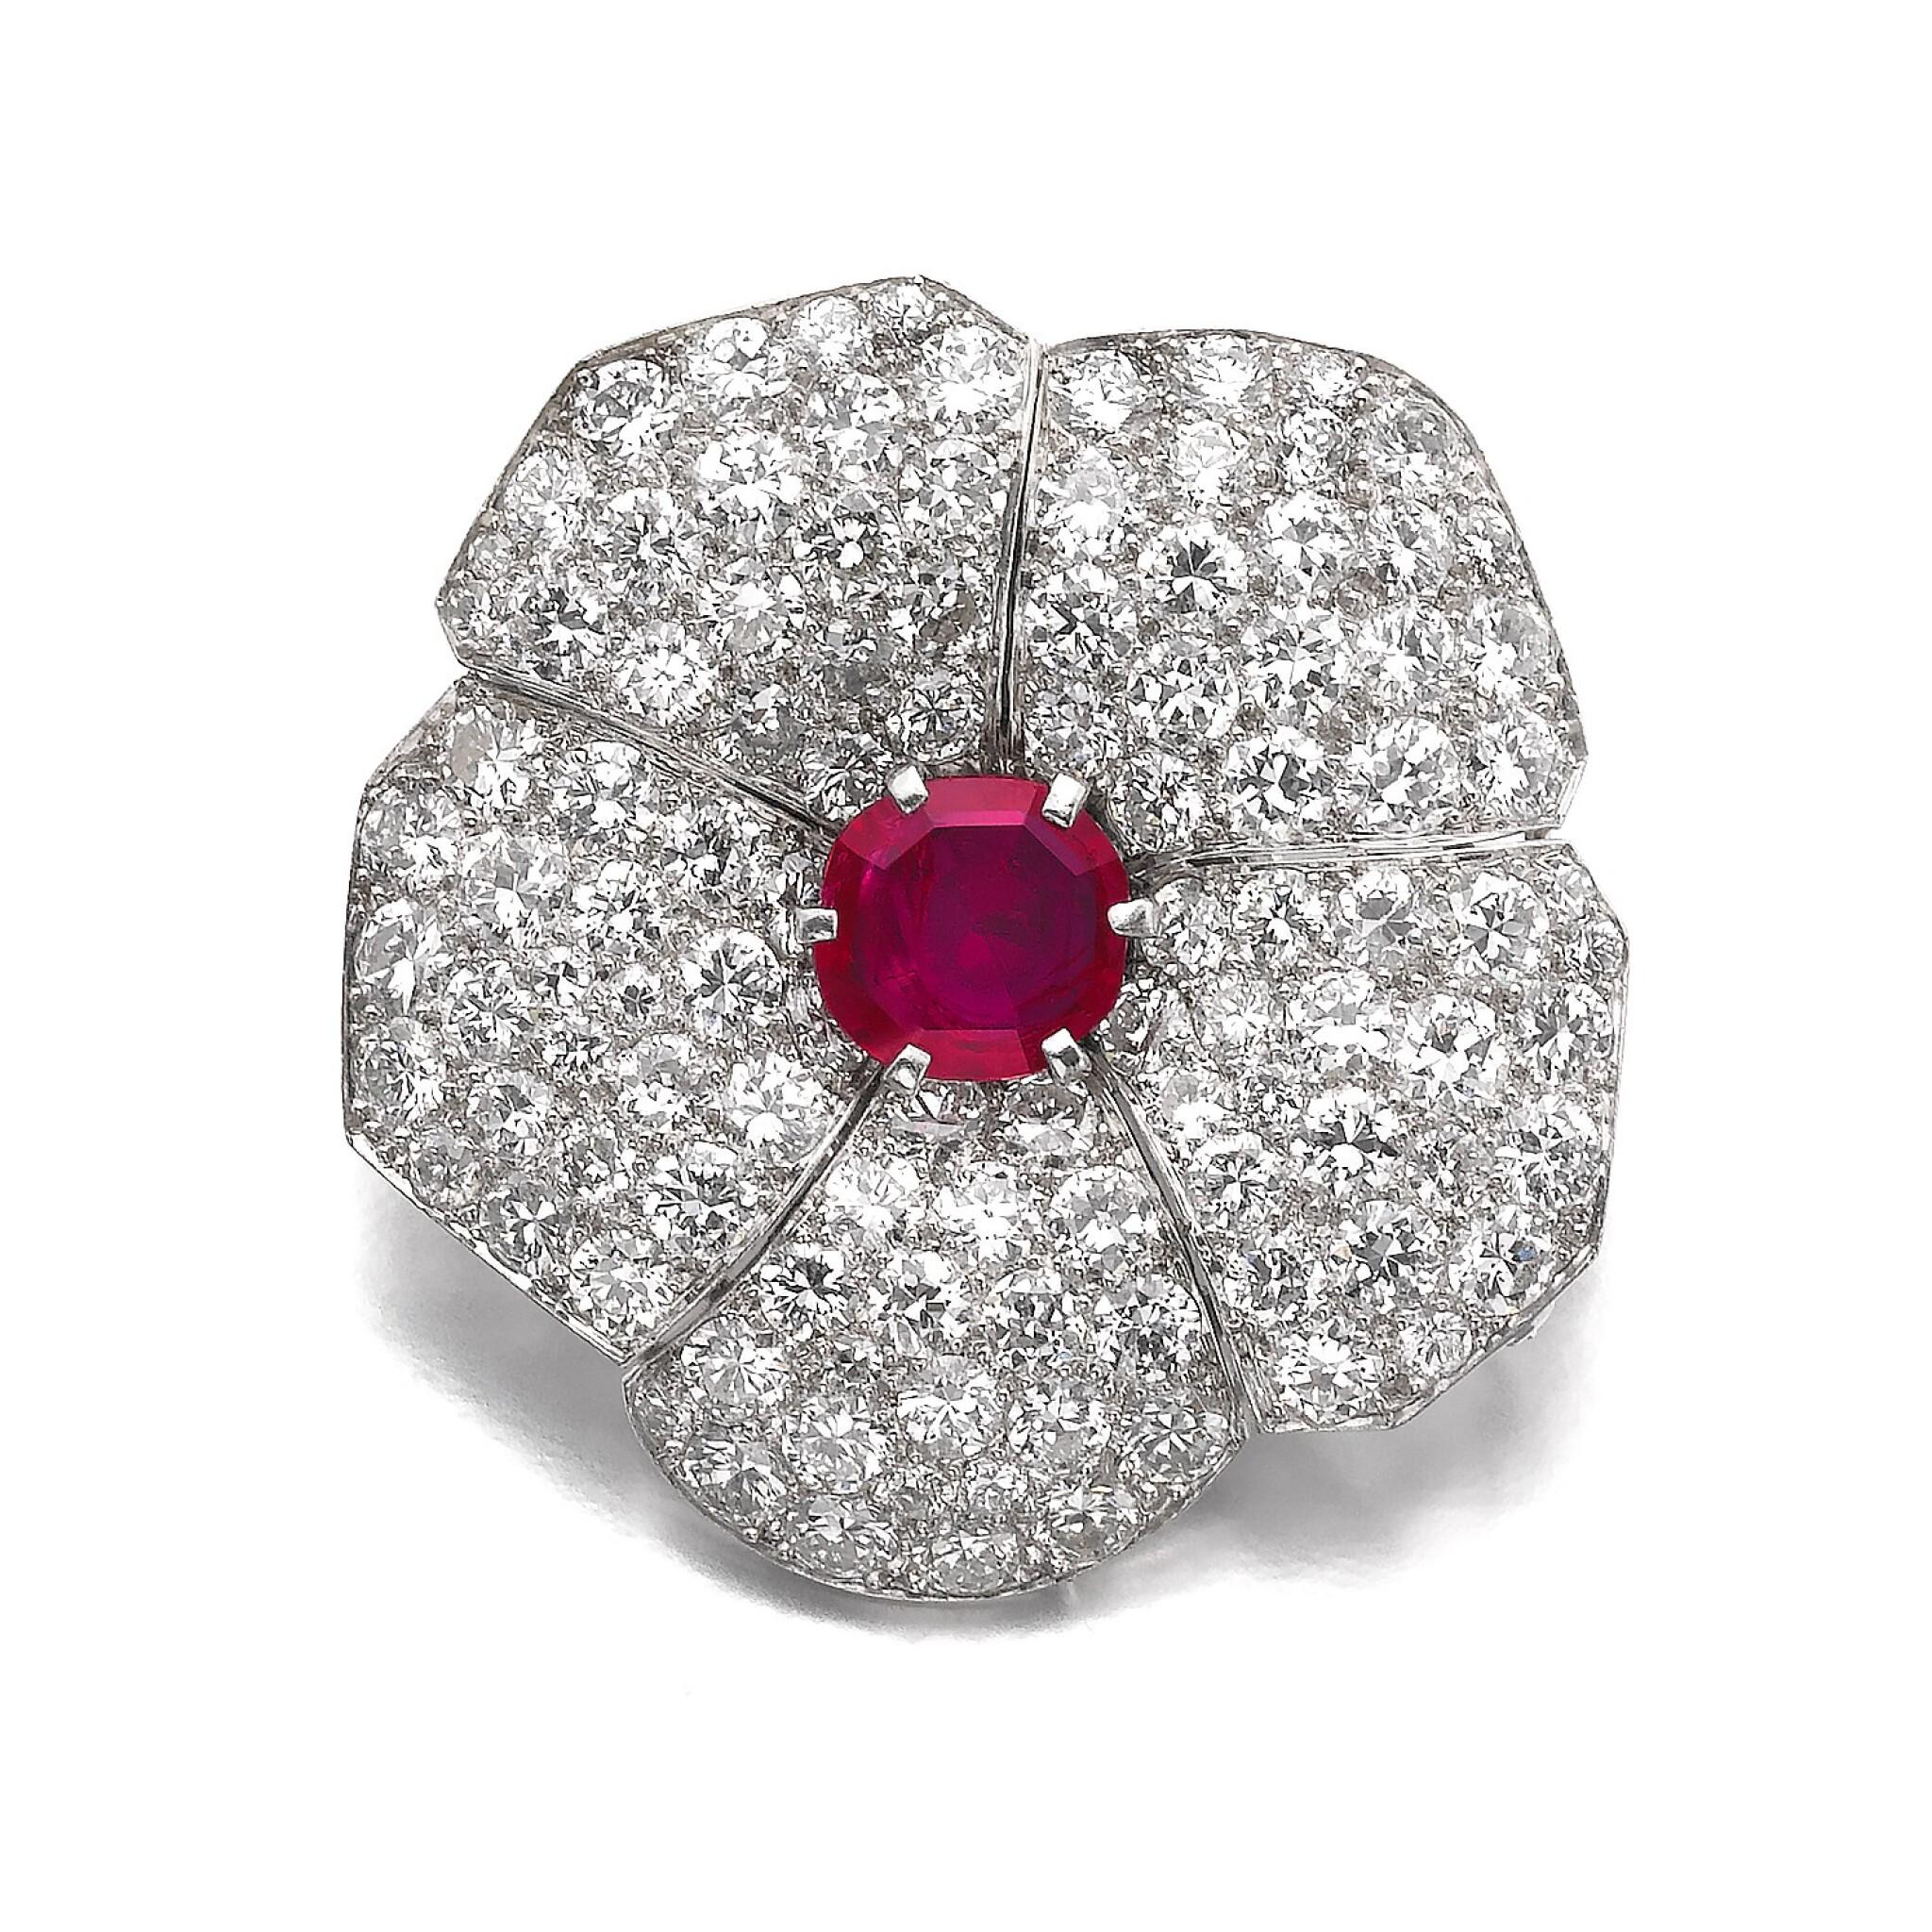 View full screen - View 1 of Lot 601. Cartier | Ruby and diamond brooch, circa 1937 | 卡地亞 | 紅寶石配鑽石別針, 約1937年.